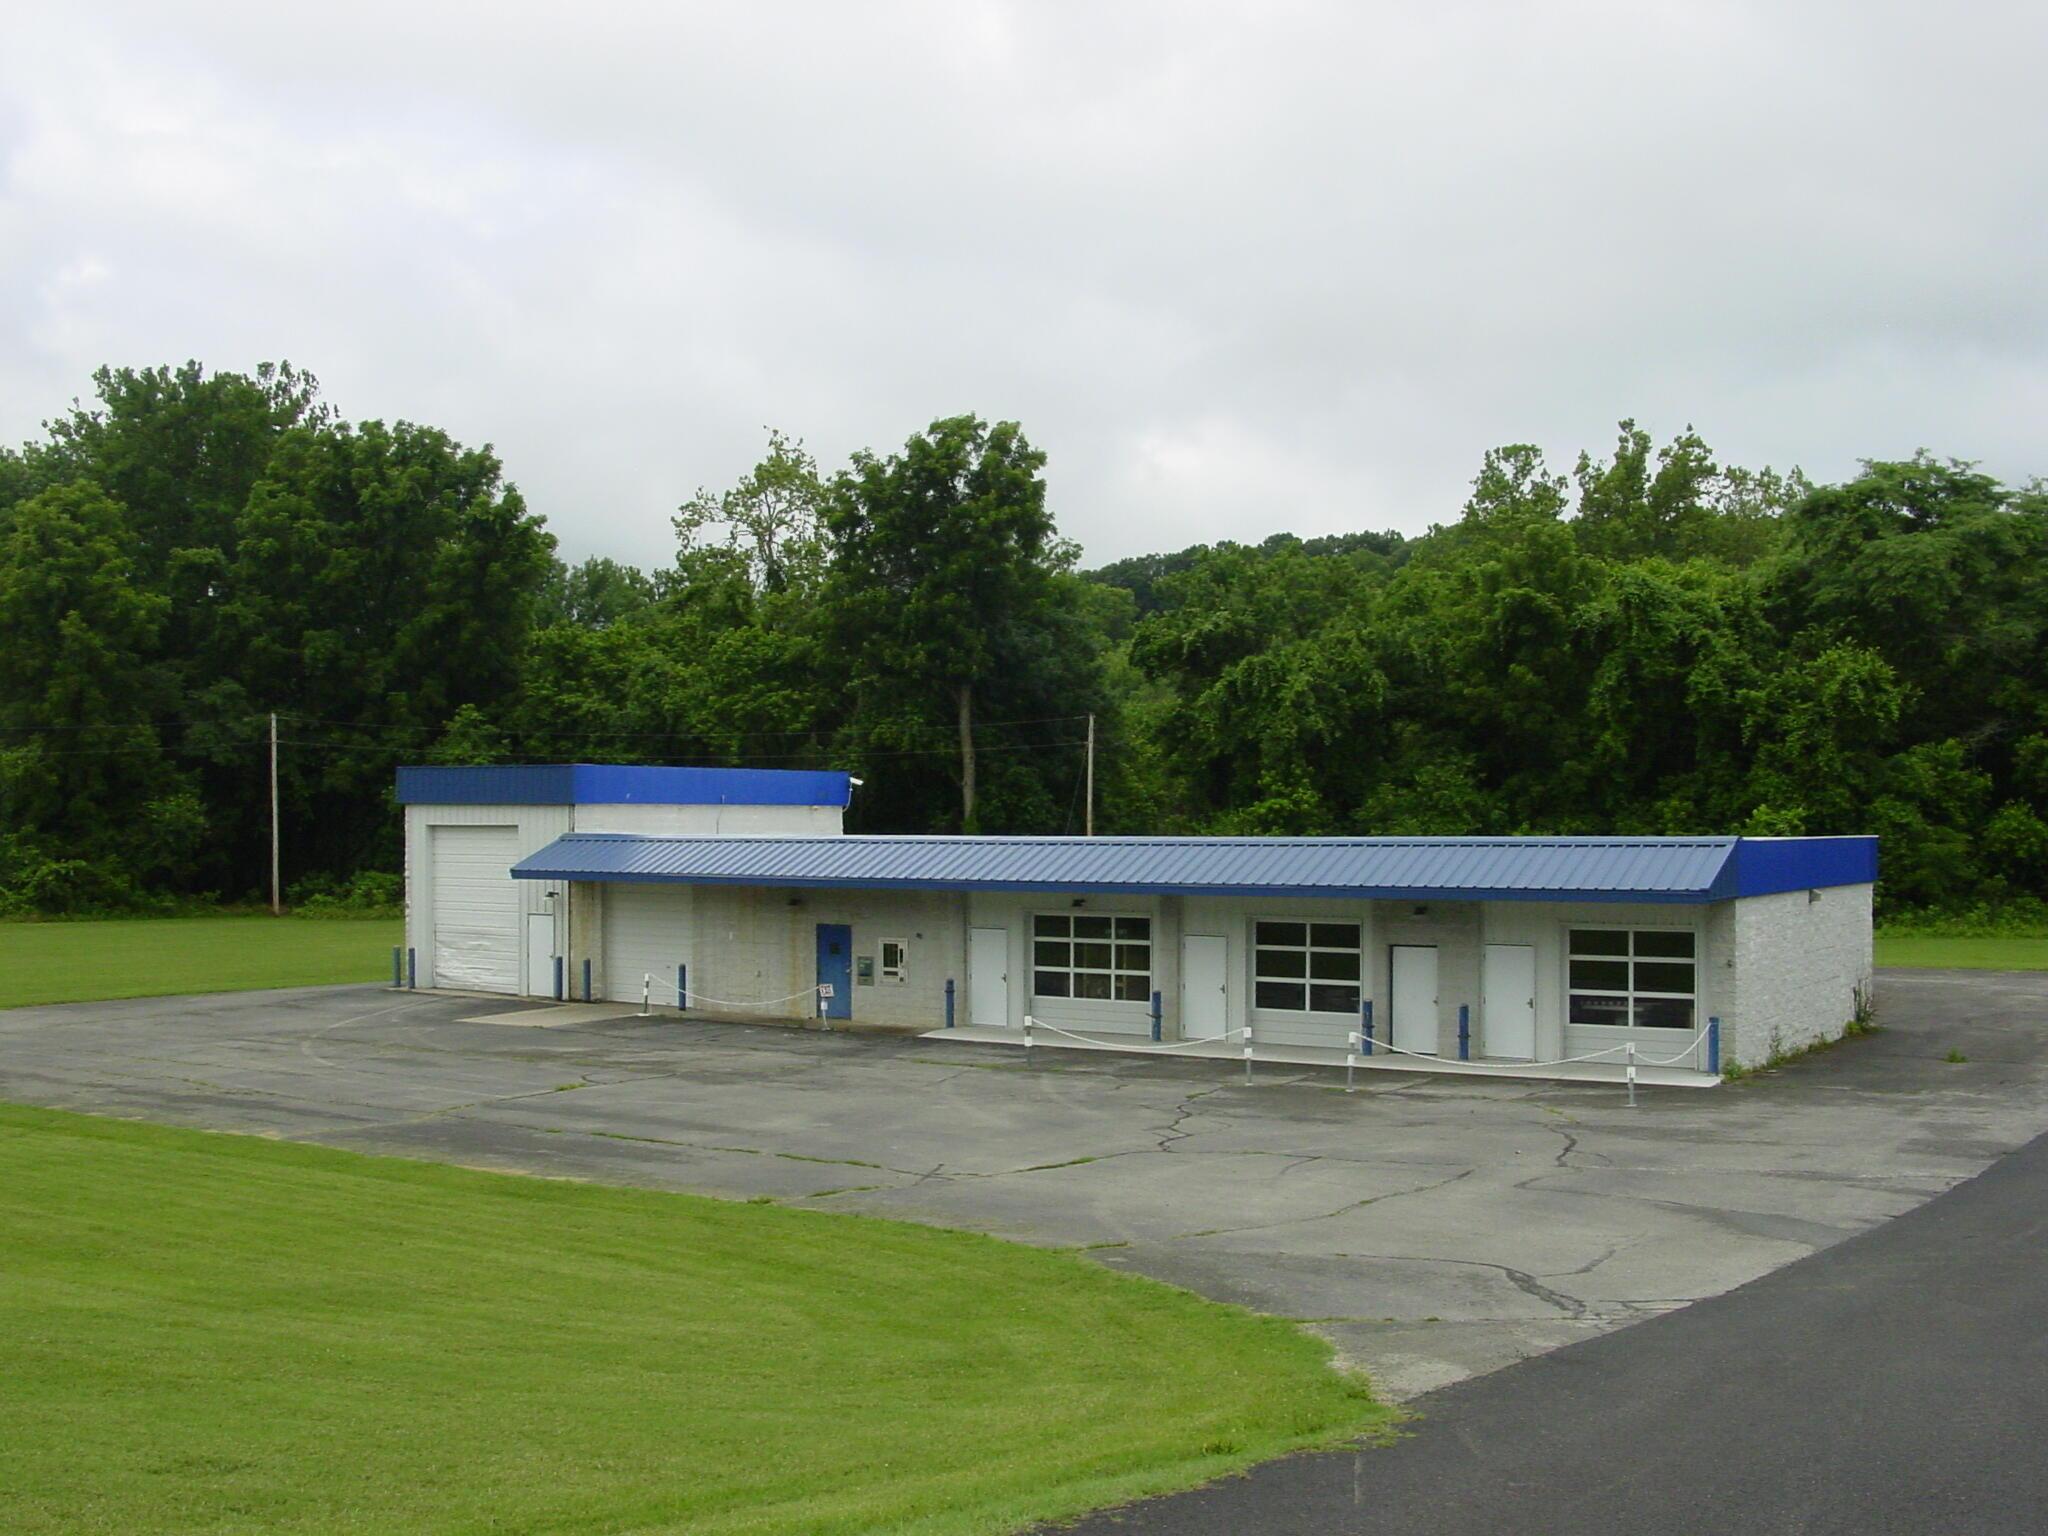 424 West Rose Avenue Crane, MO 65633